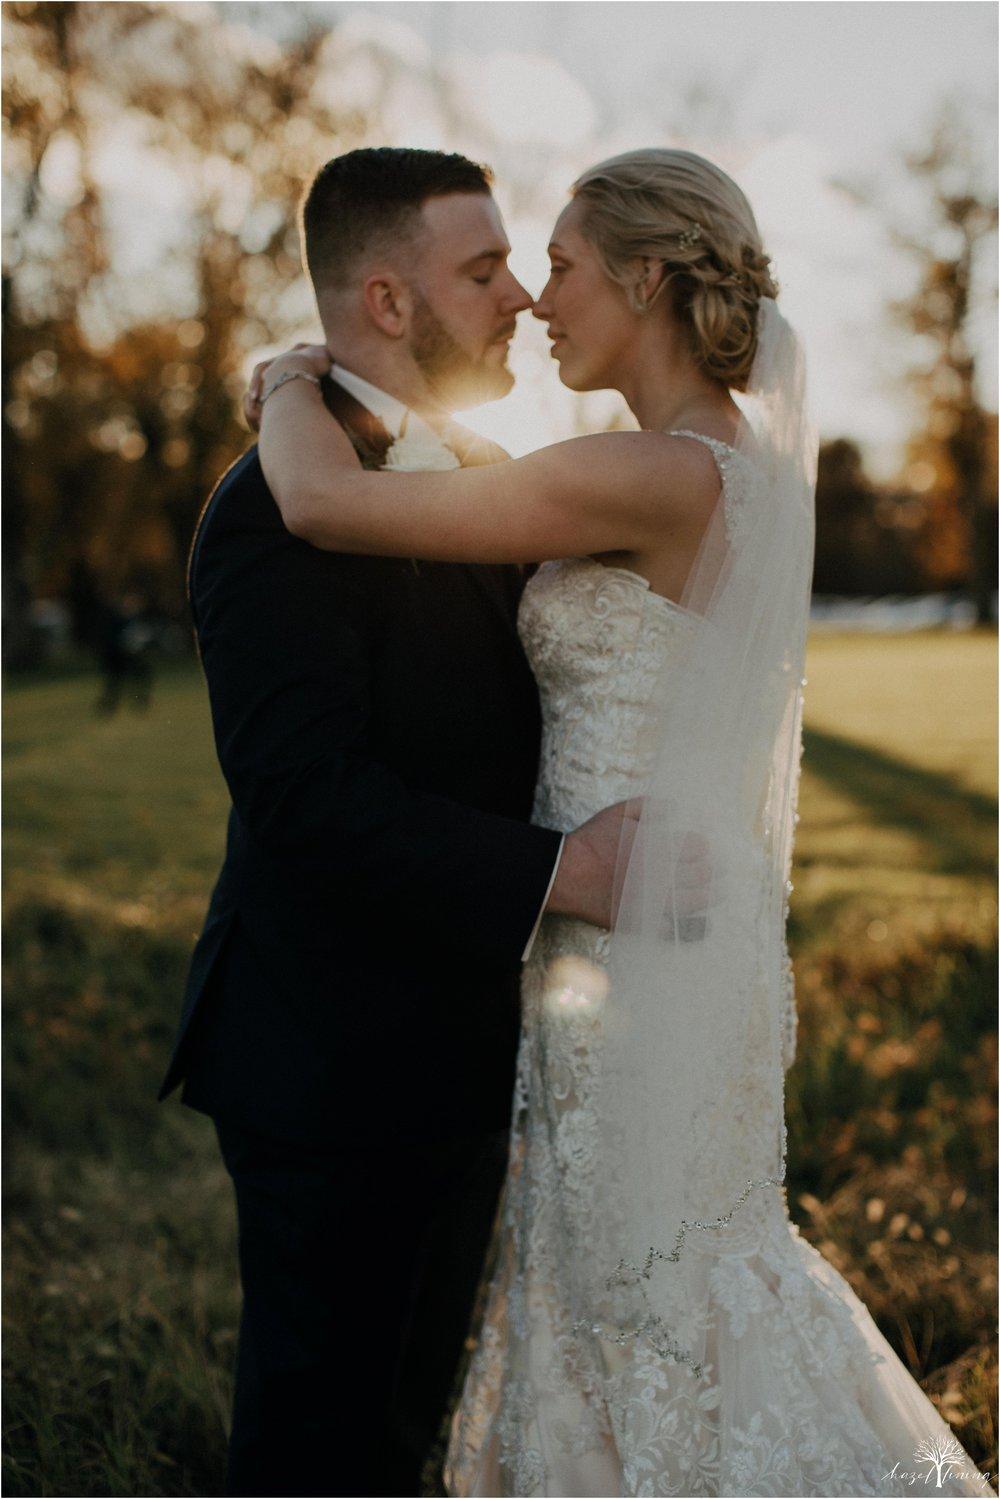 briana-krans-greg-johnston-farm-bakery-and-events-fall-wedding_0118.jpg